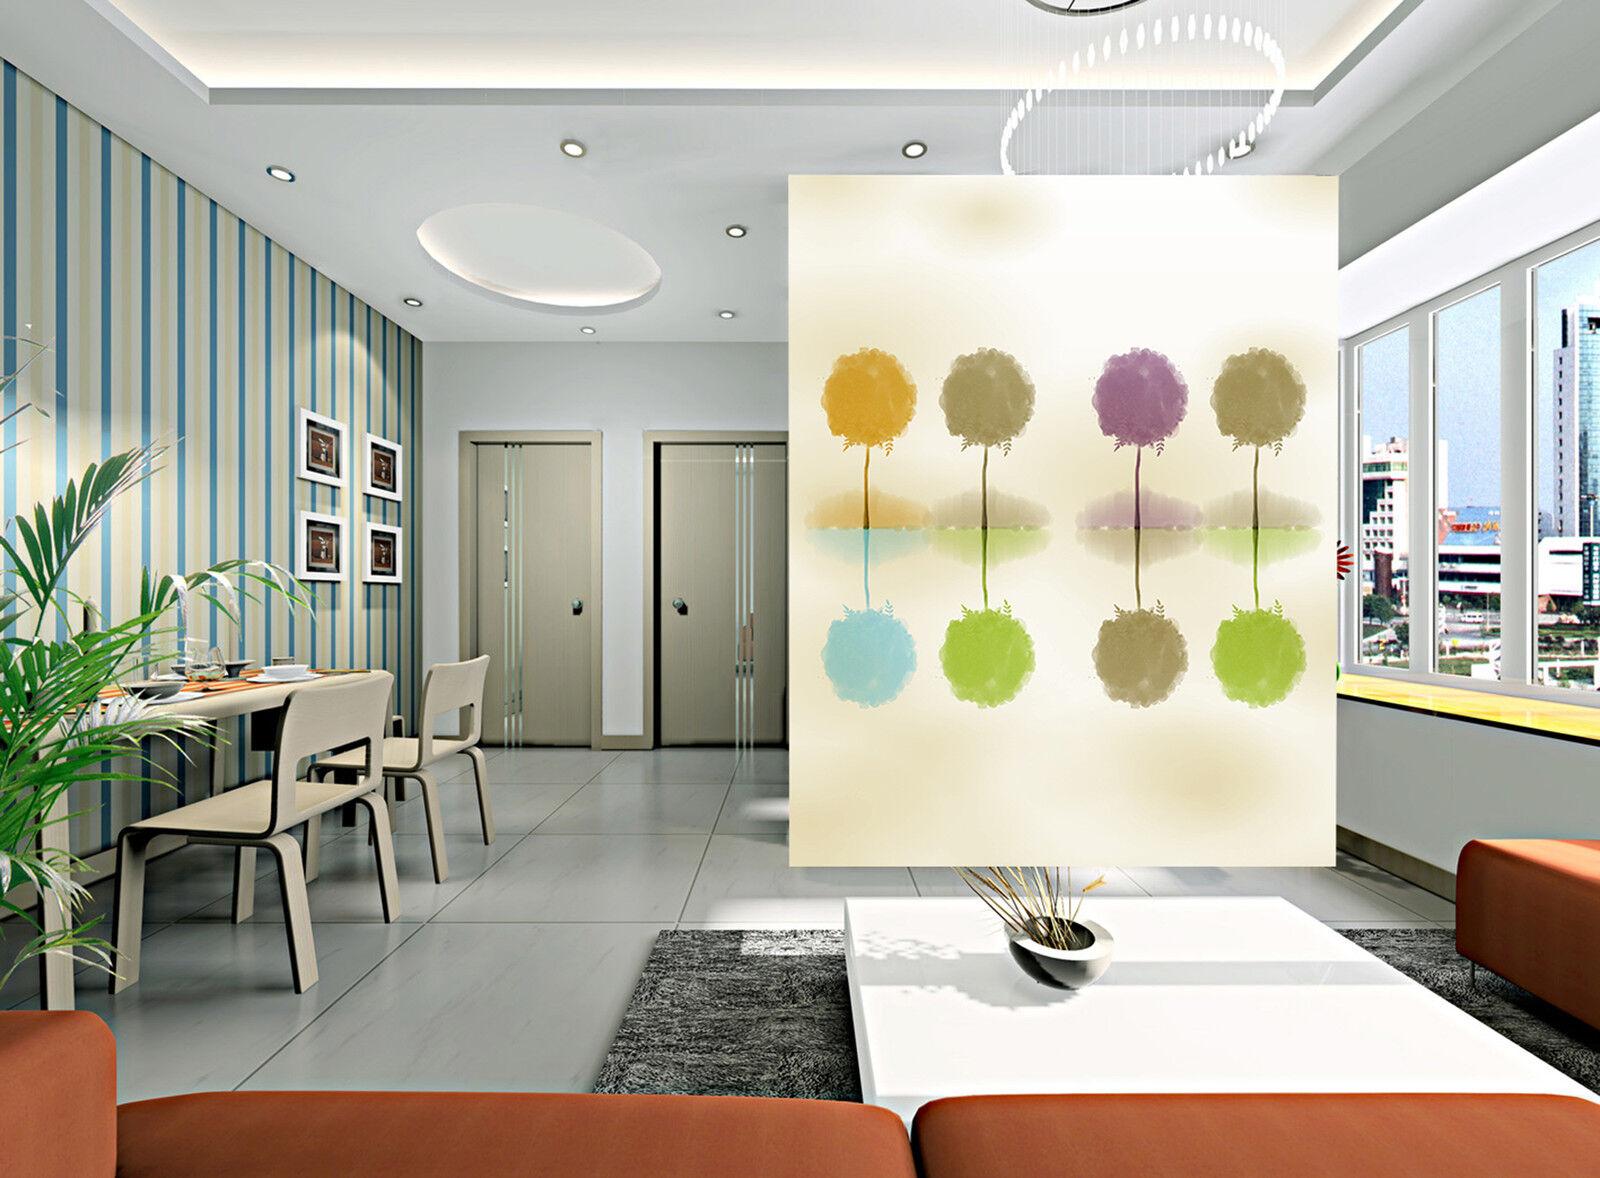 3D Painted Stamm Fototapeten Wandbild Fototapete Bild Tapete Familie Kinder